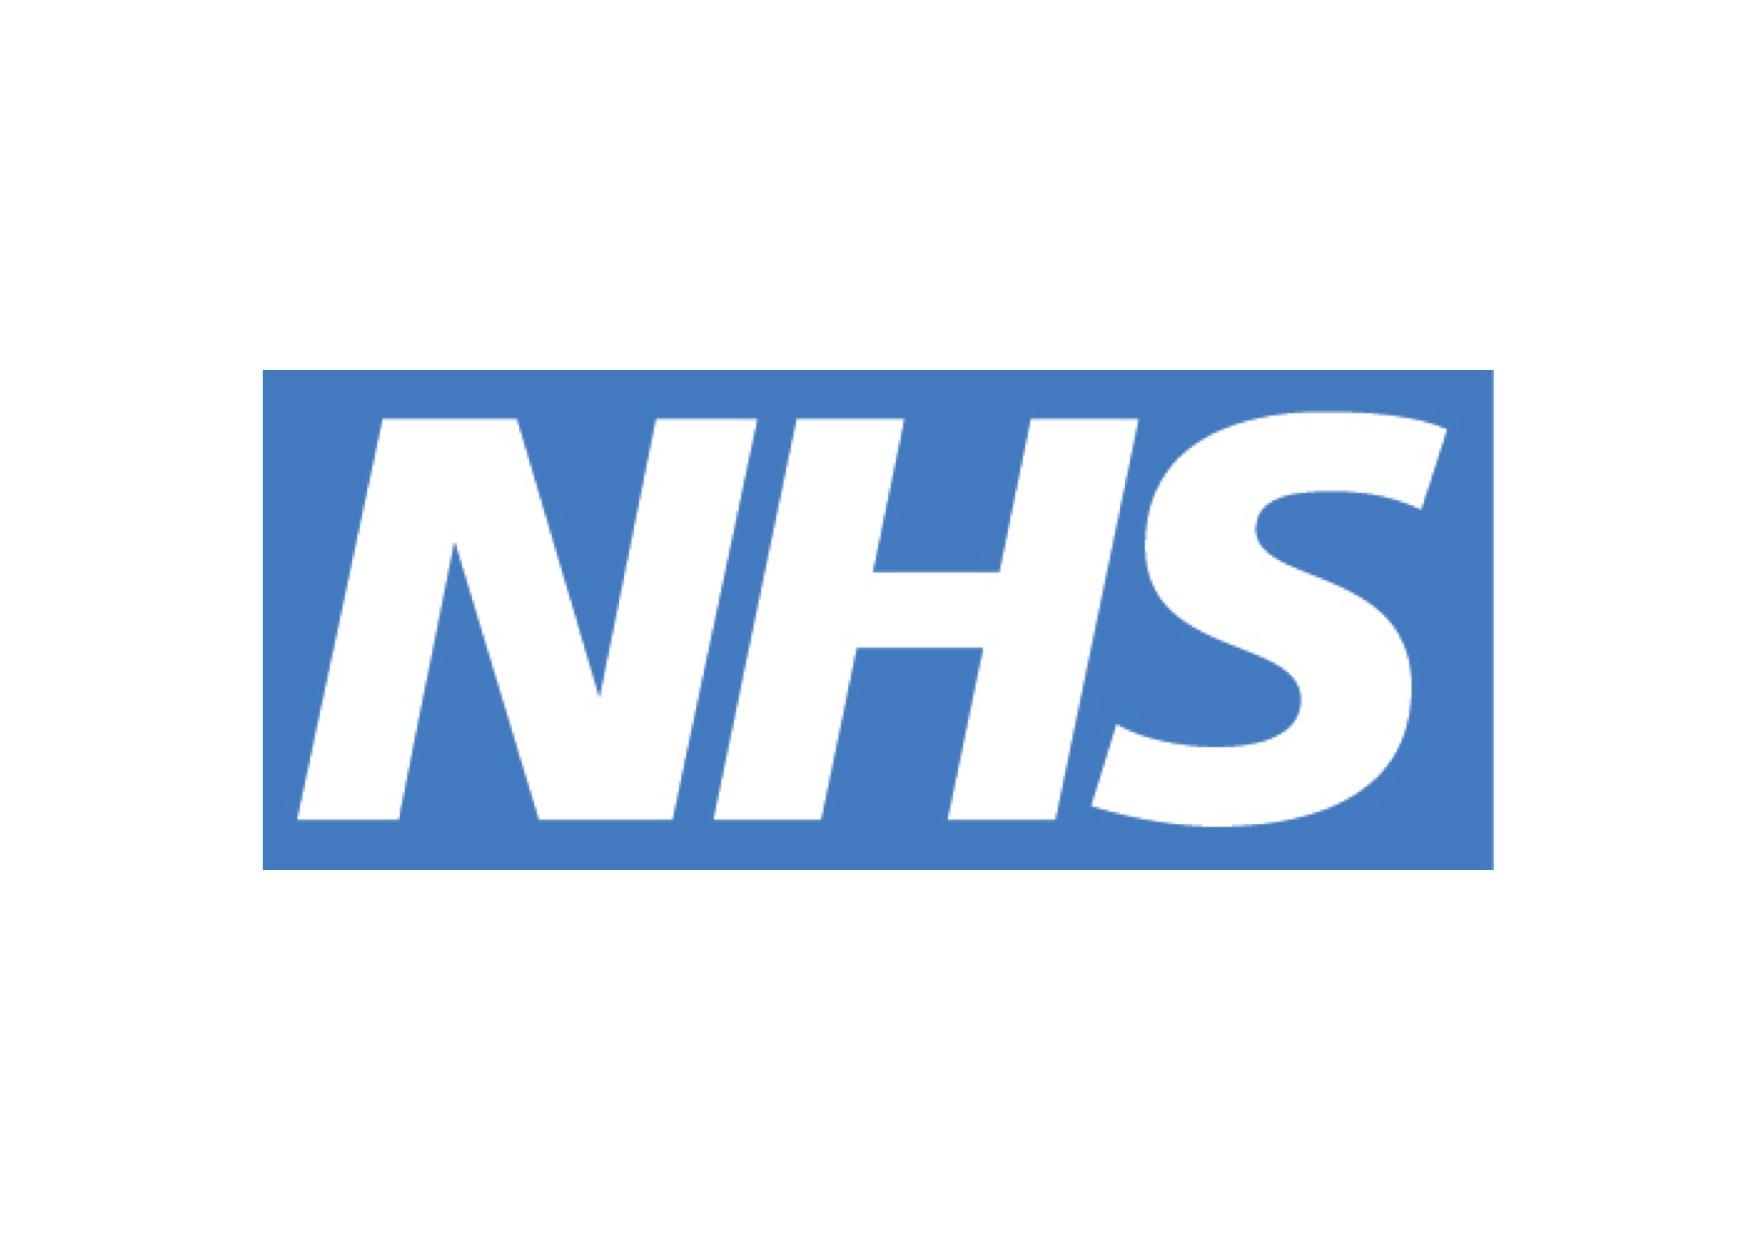 Pathology NHS Connection Express Plasma Express Service